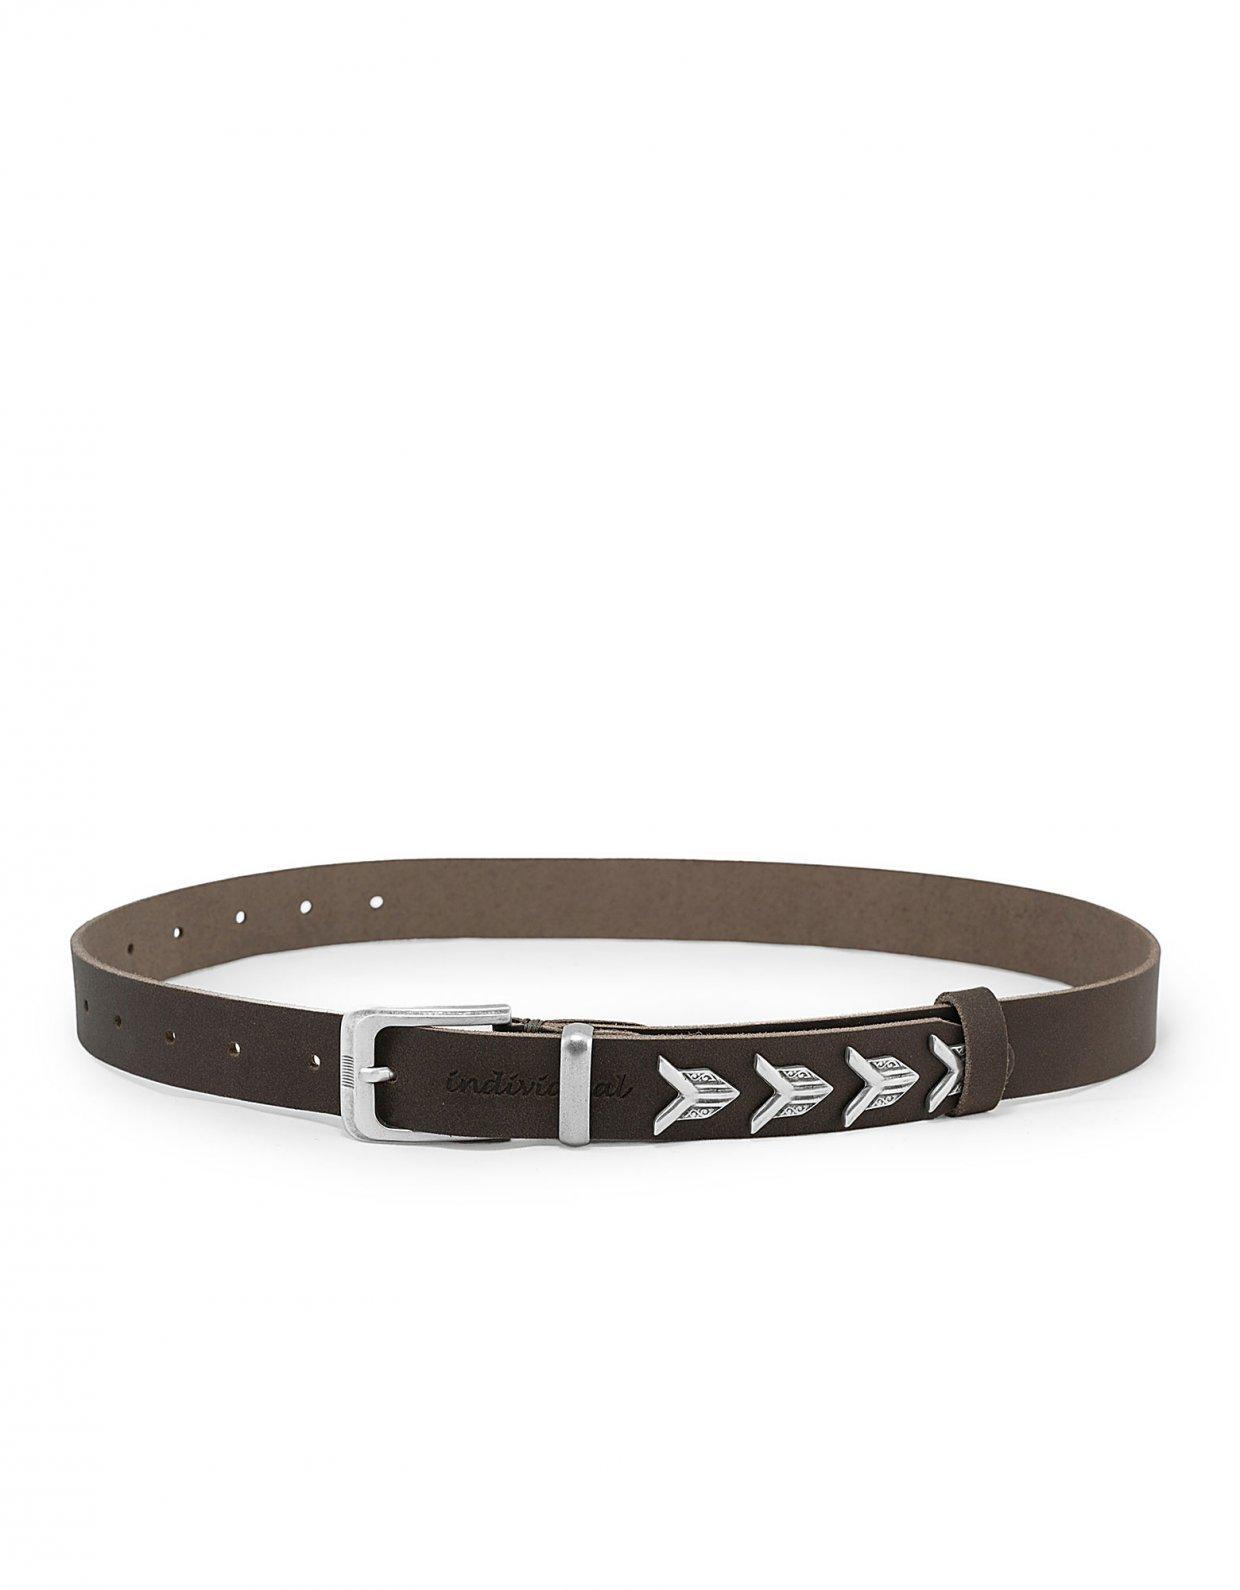 Individual Art Leather Paranoid belt brown